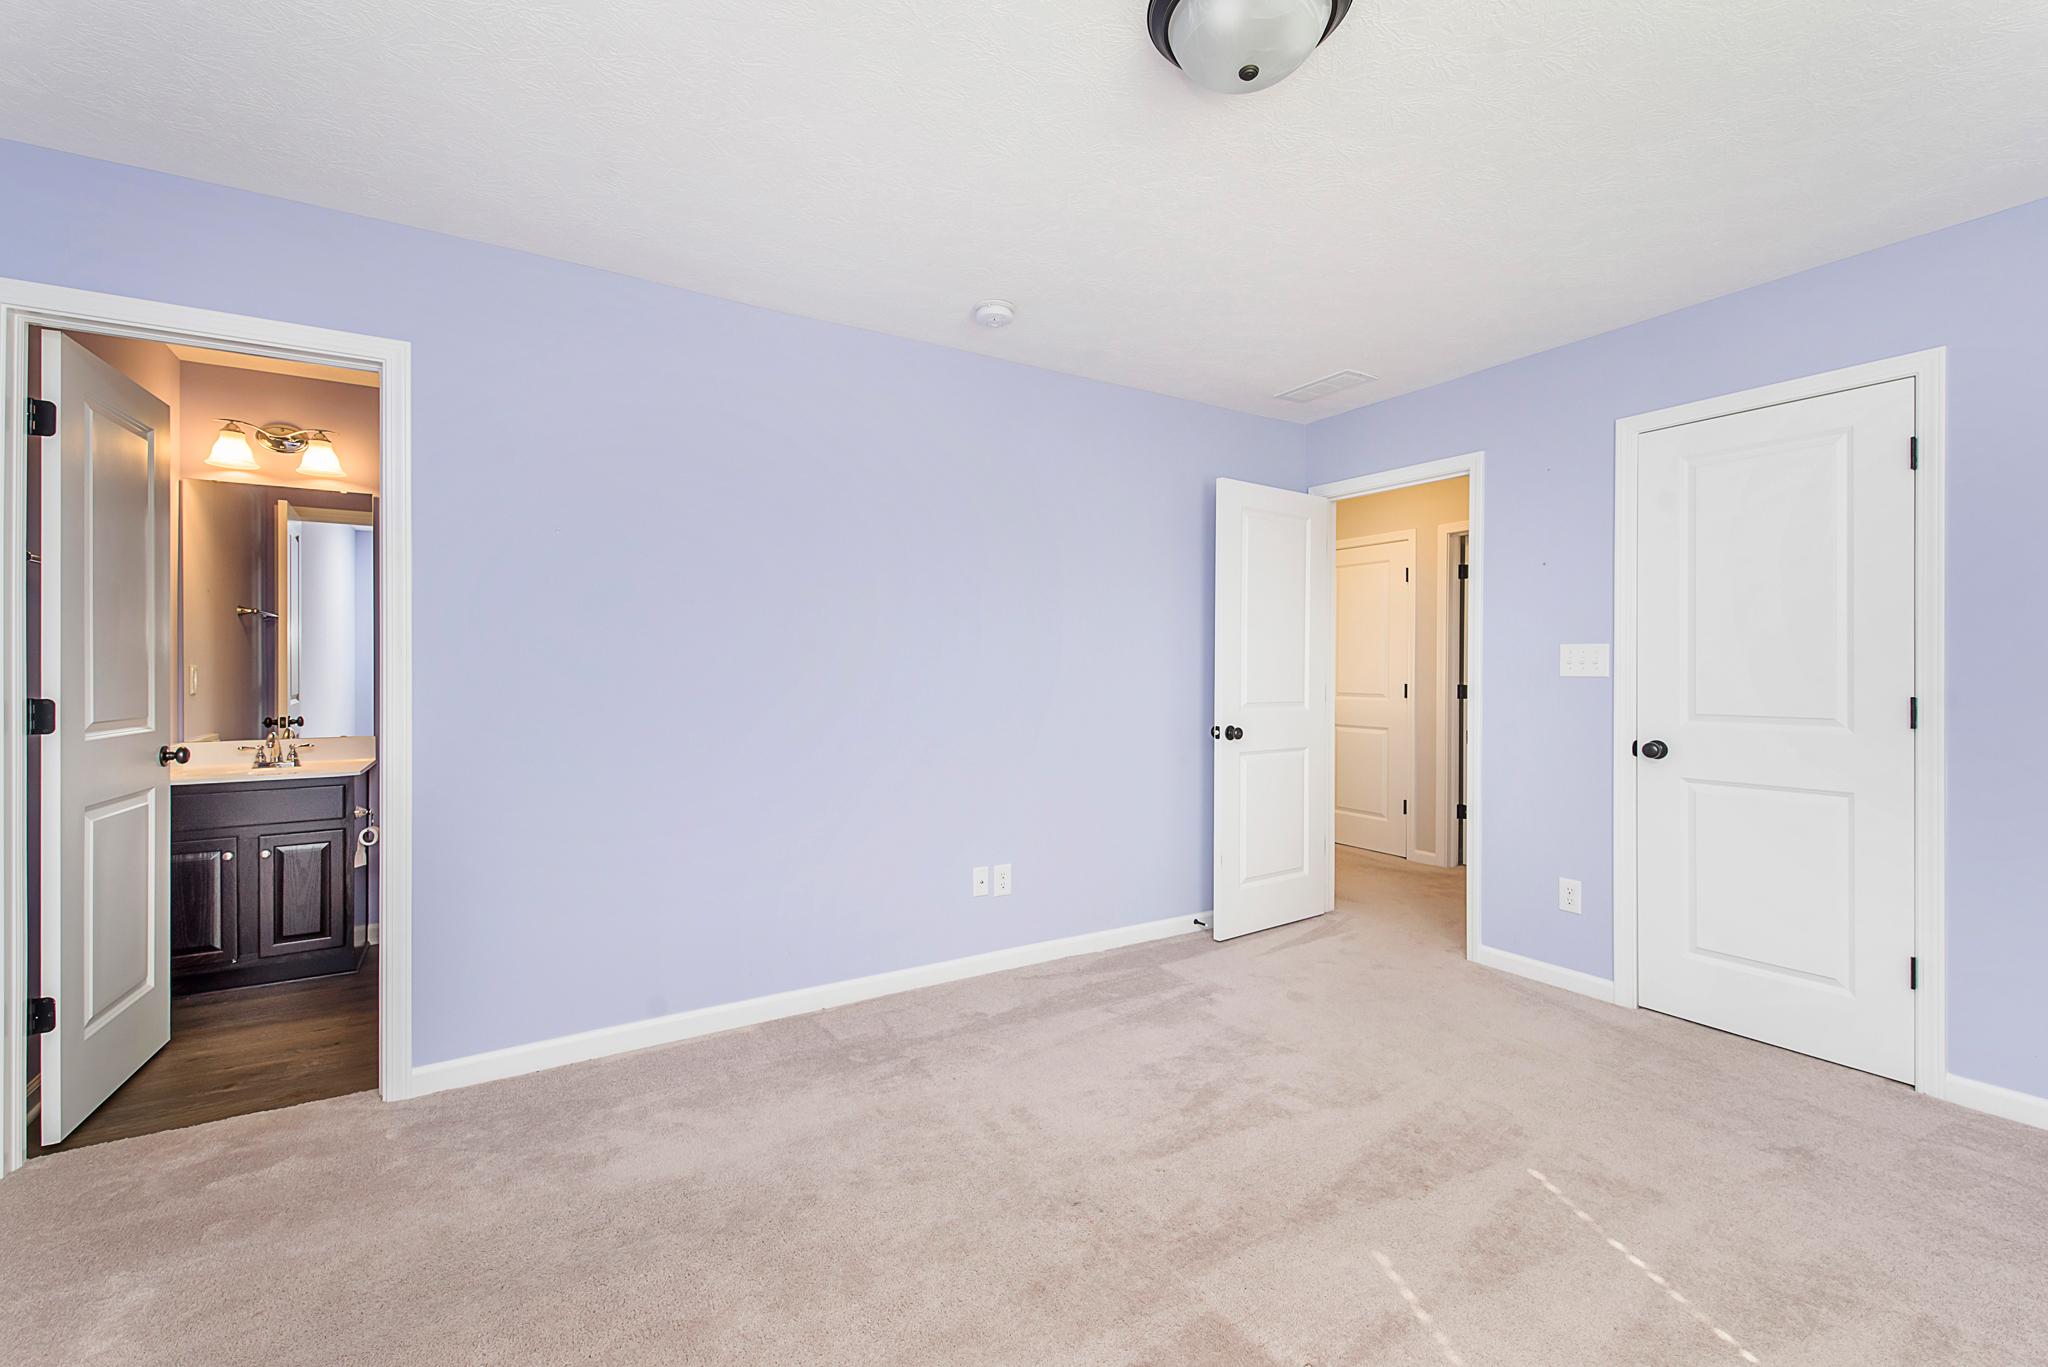 22_Bedroom 2.jpg